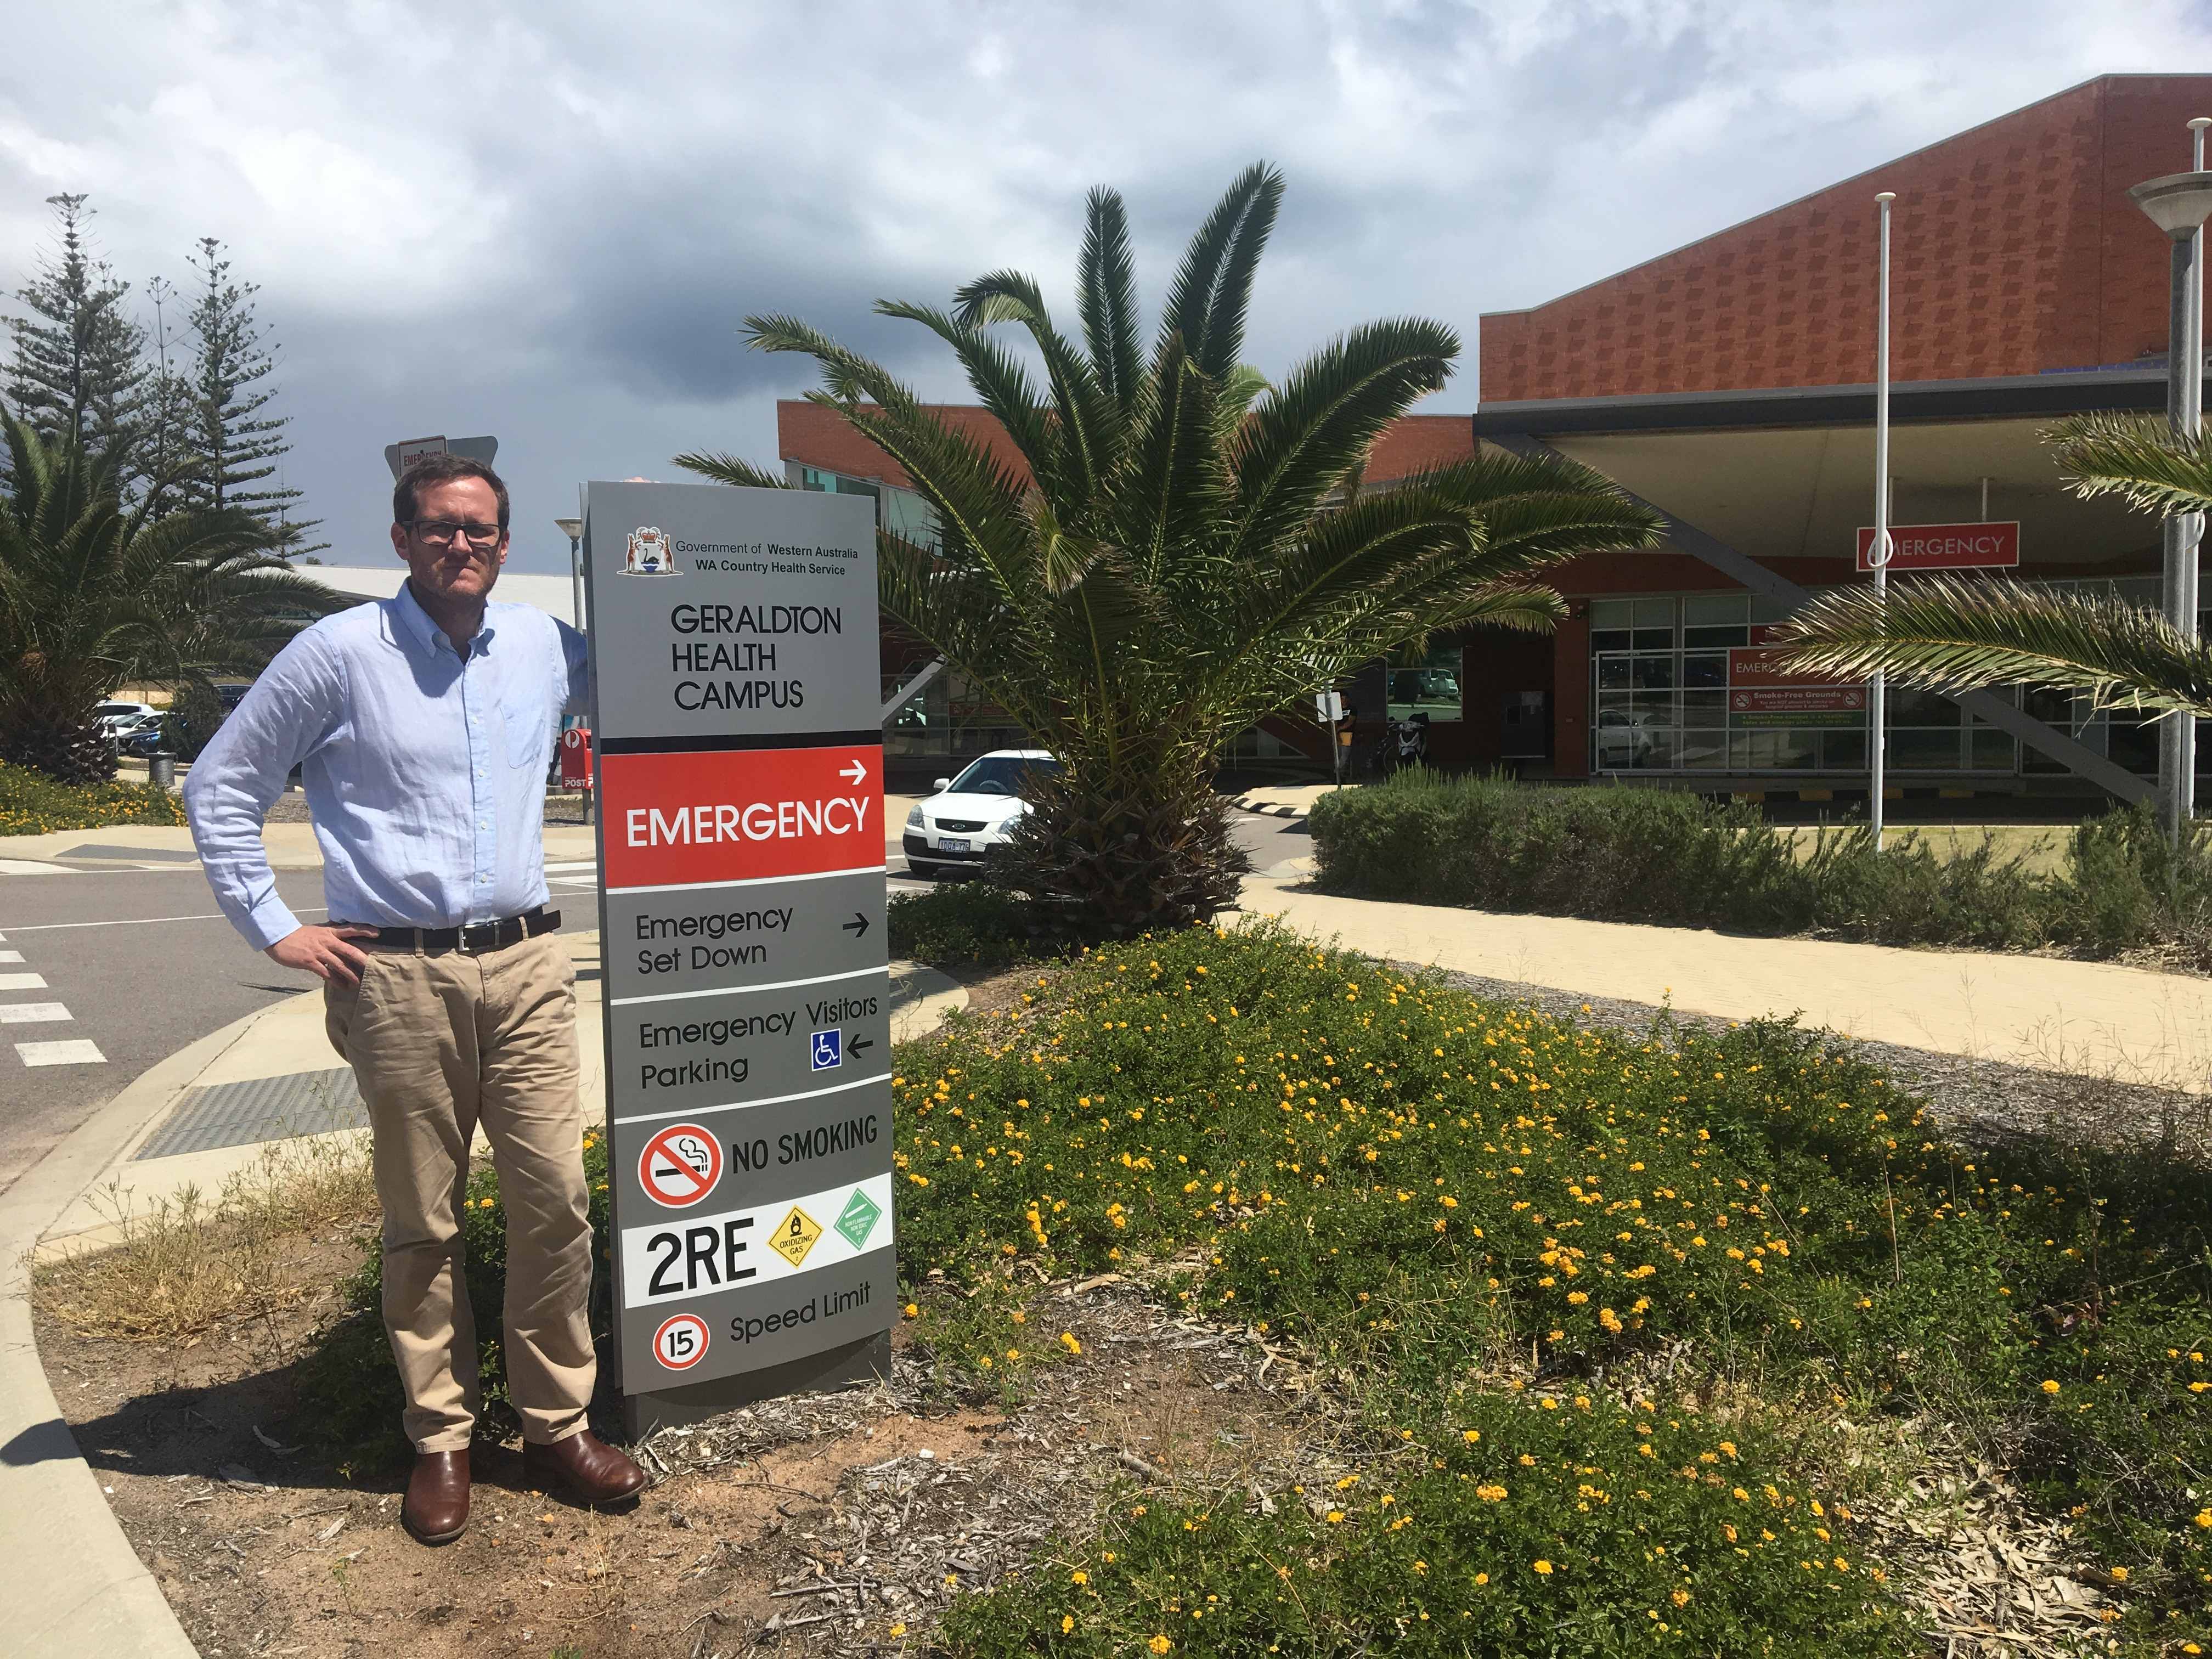 Geraldton_Hospital_.JPG